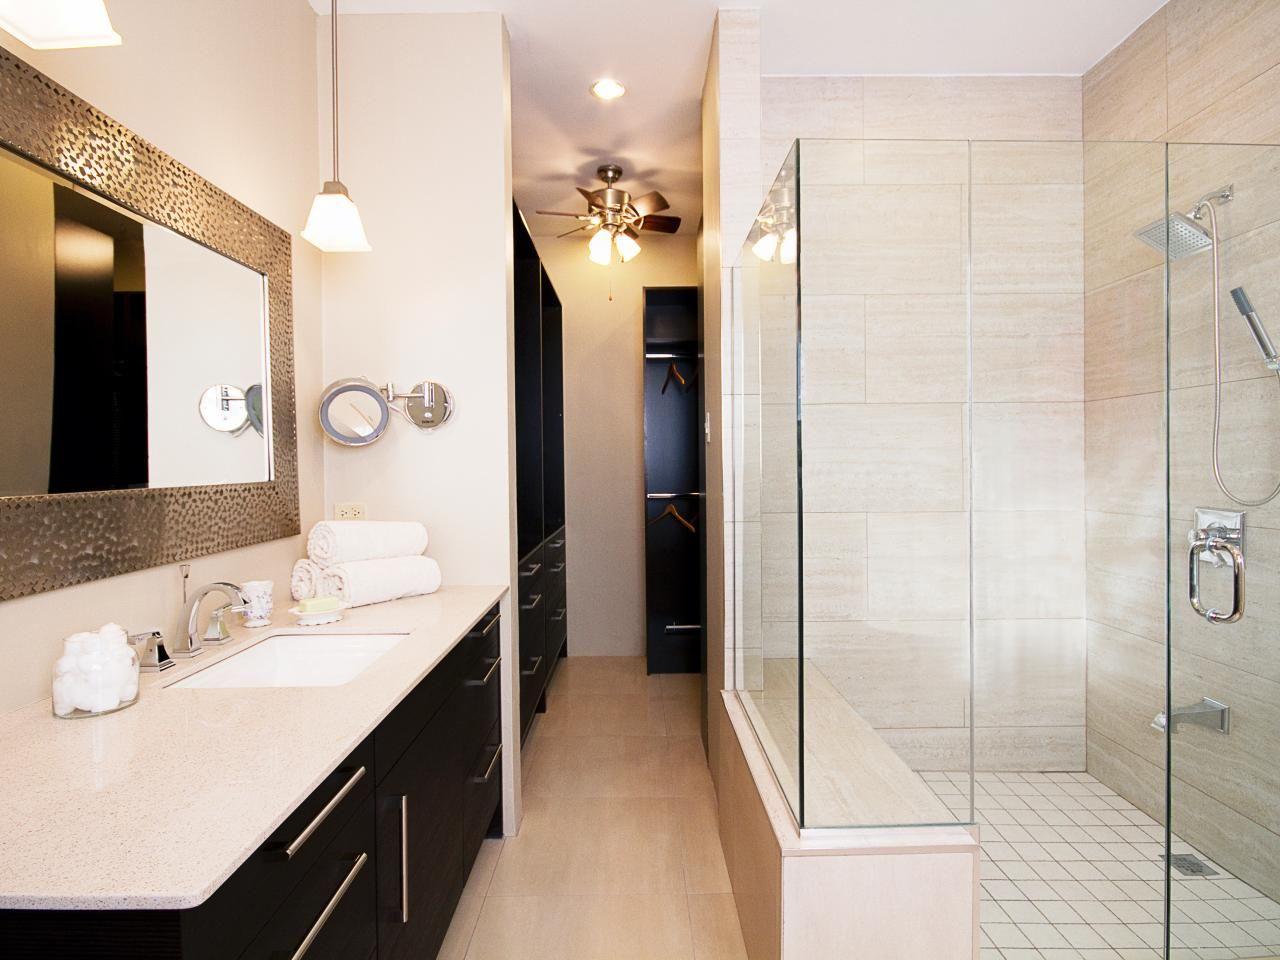 Bathroom Shower Designs | House: Bathrooms | Bathroom layout ... on hgtv remodeled bathrooms, hgtv pool designs, hgtv home bathrooms, hgtv property brothers bathrooms, hgtv bar designs, hgtv master bathrooms gallery, hgtv kitchen, guest suite design, hgtv walk in closet designs, hgtv deck designs, hgtv luxury bathrooms, hgtv elegant bathrooms, hgtv loft designs, hgtv bathrooms candice olson, hgtv best bathrooms, hgtv house designs, hgtv headboards designs, hgtv beautiful bathrooms, hgtv spa bathrooms, hgtv traditional bathrooms,